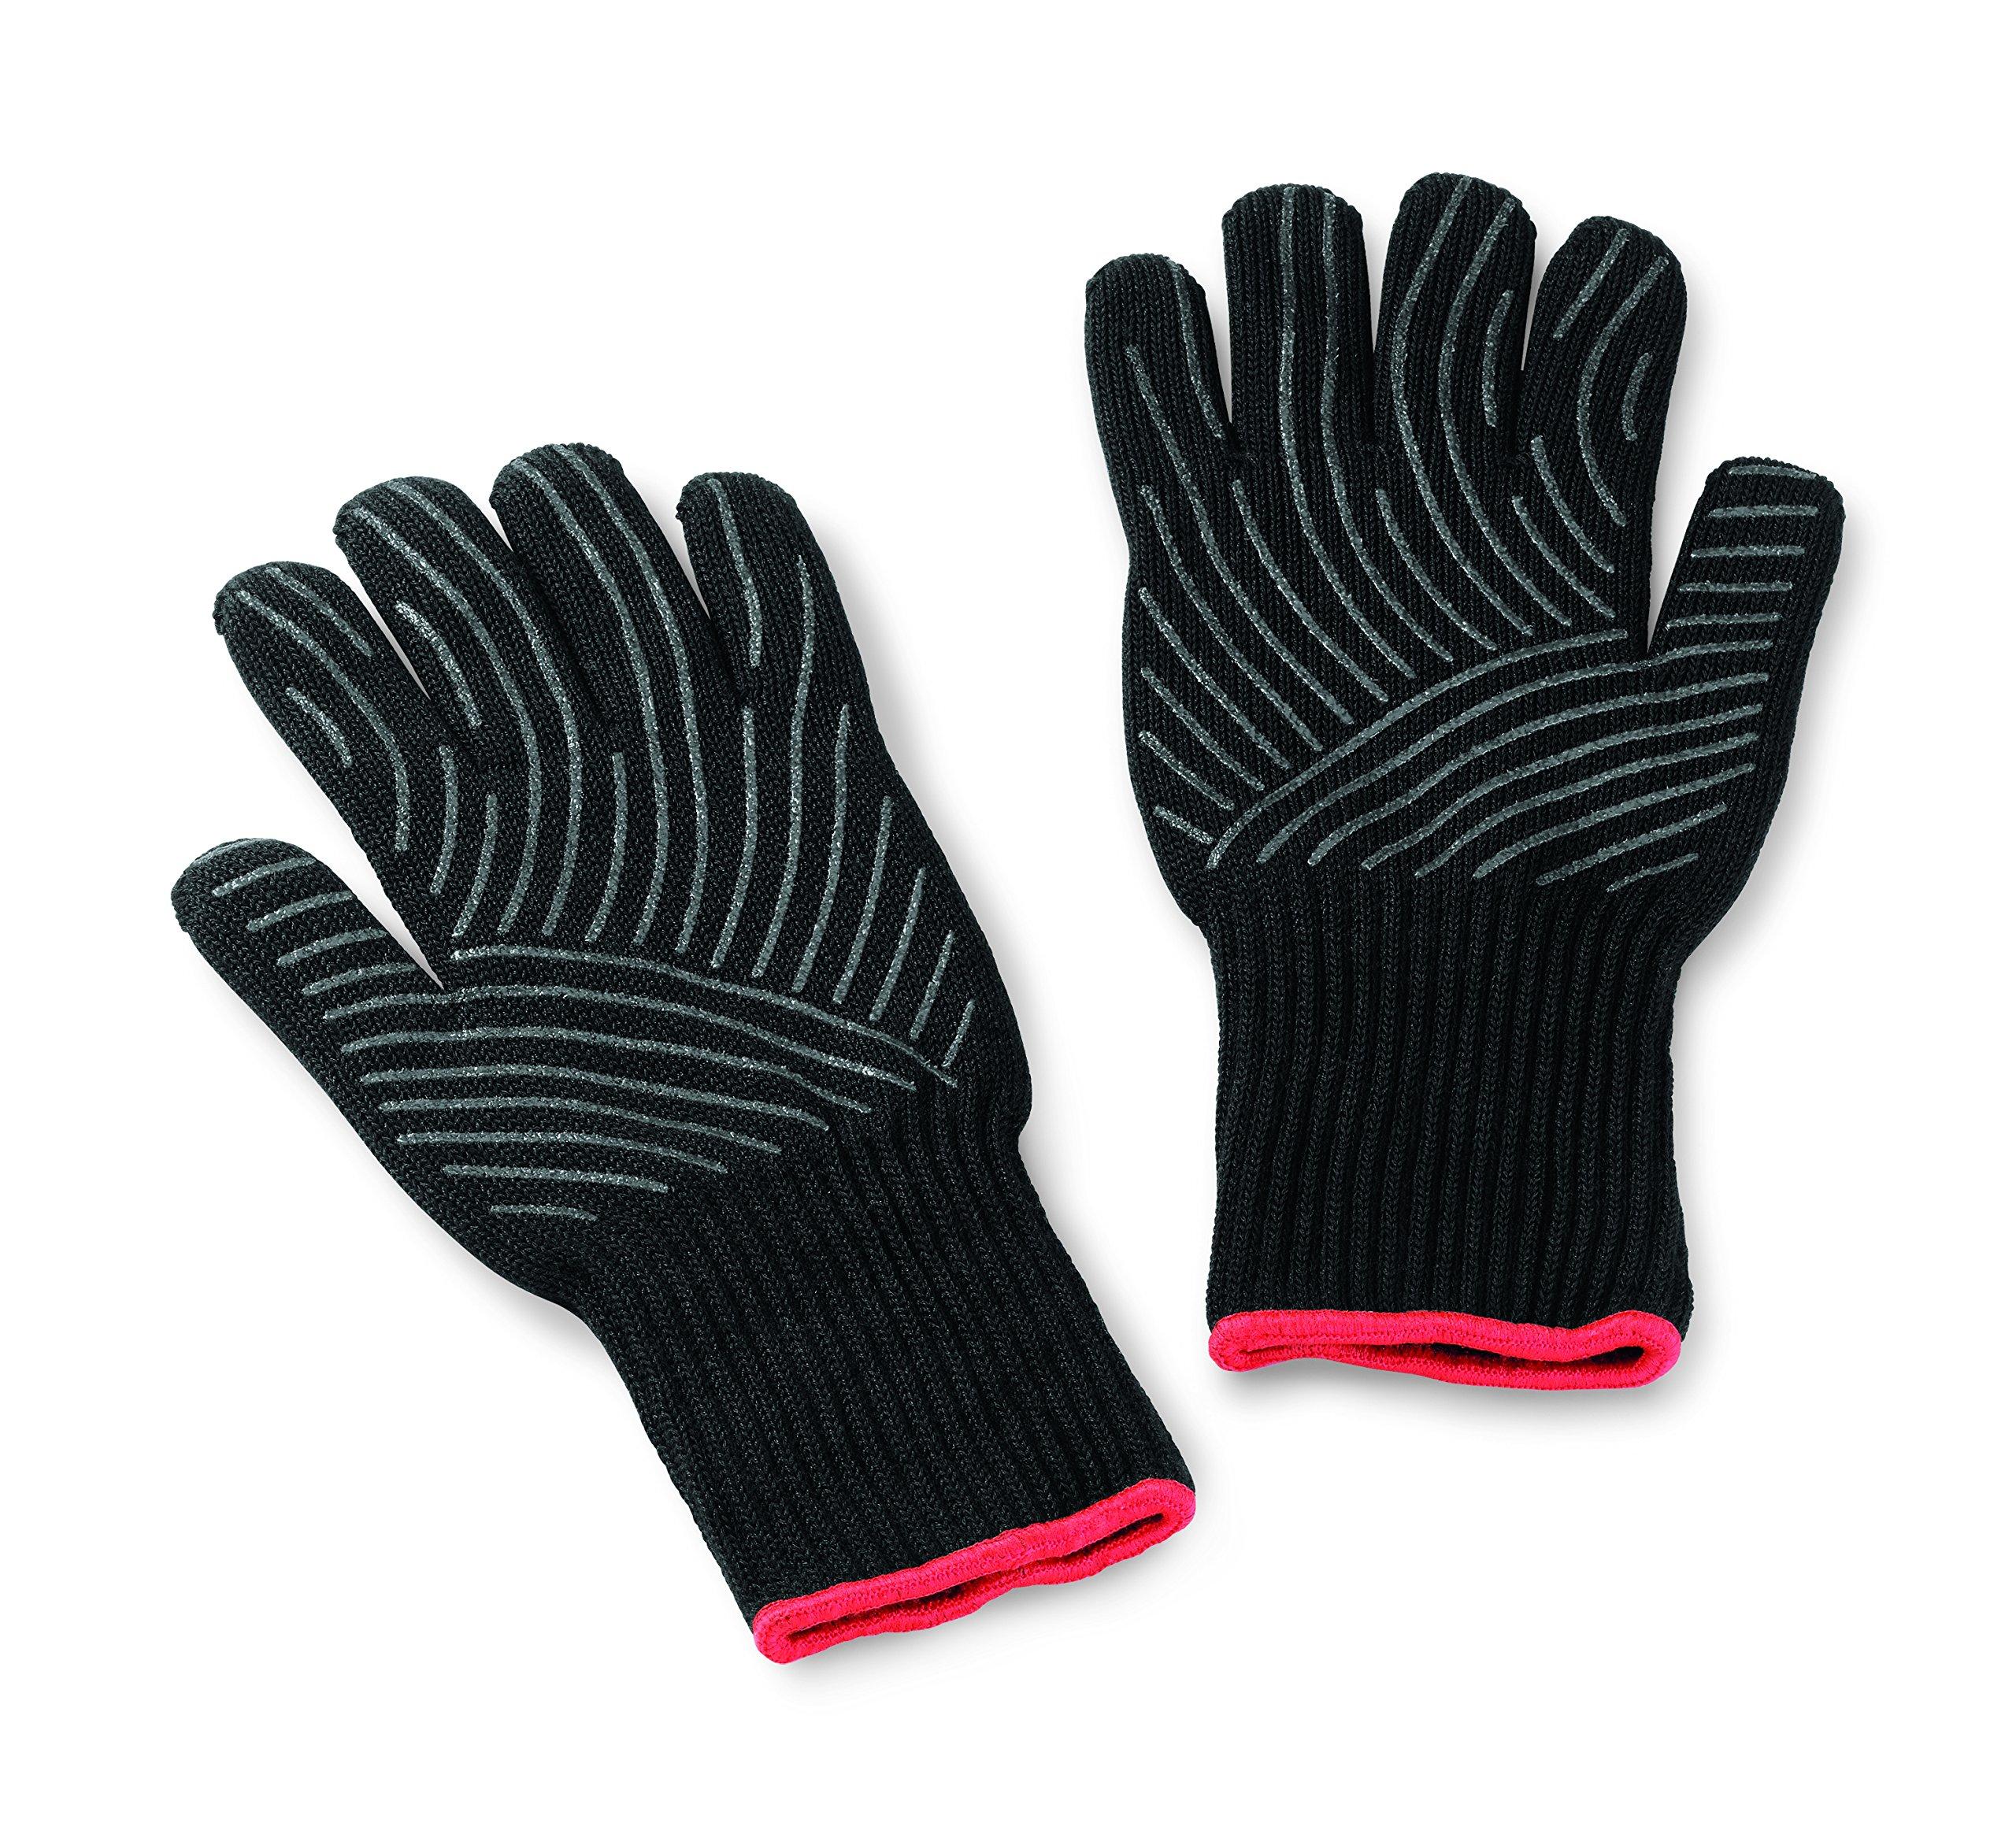 Weber 6670 Large/X-Large Premium Barbeque Glove Set by Weber